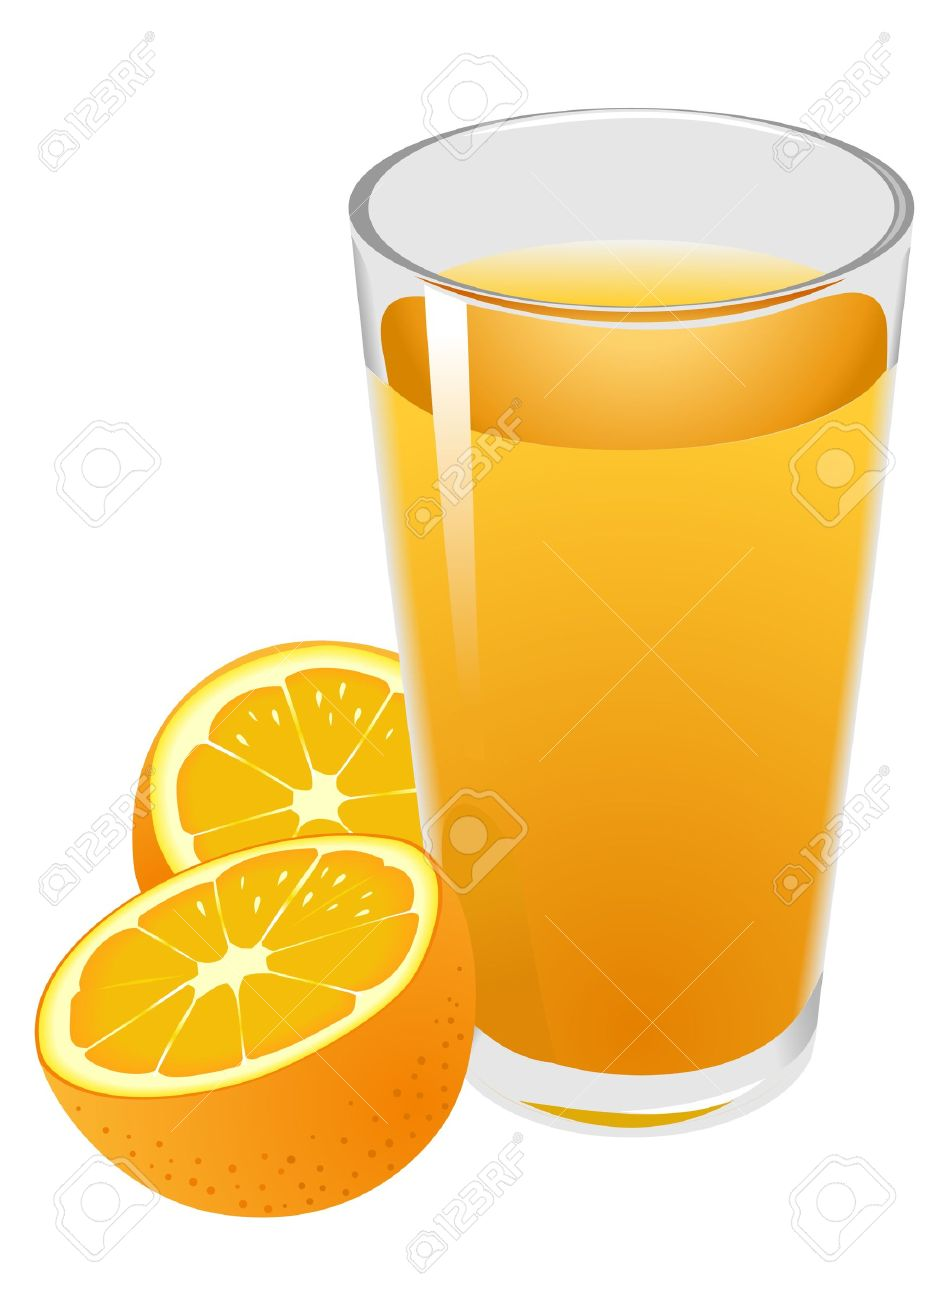 illustration of glass with orange juice and oranges royalty free rh 123rf com drinking orange juice clipart orange juice clipart free